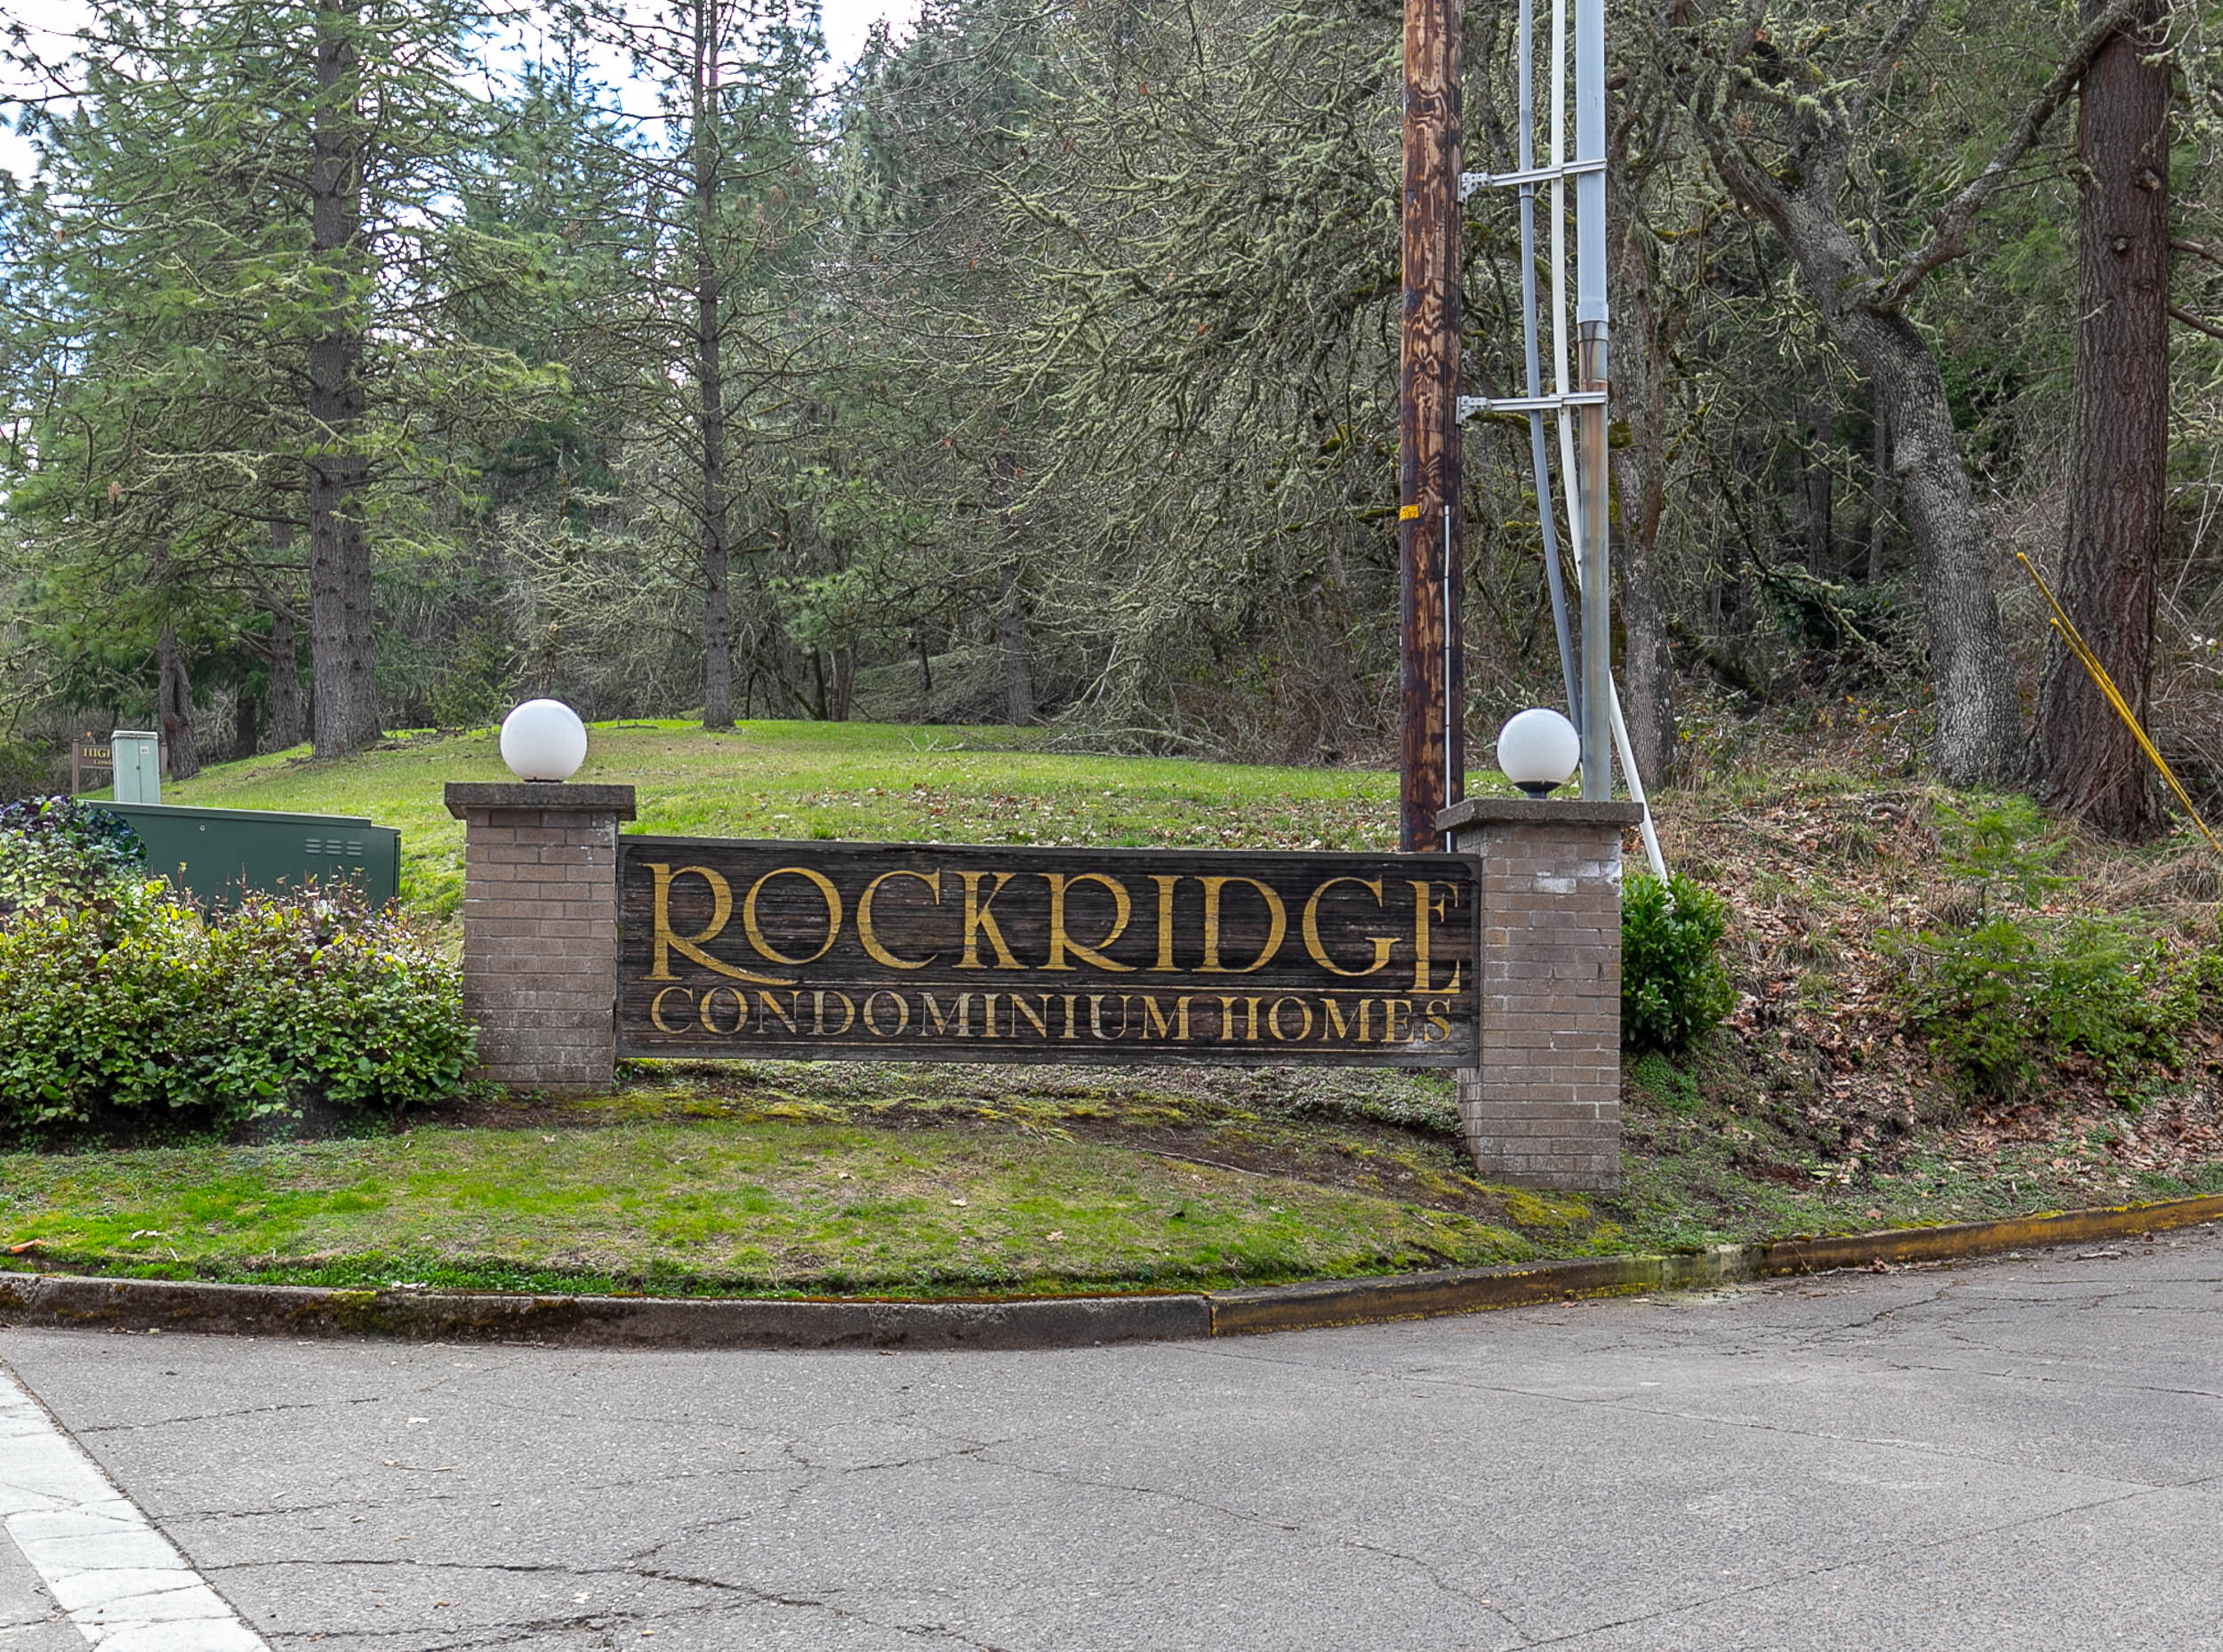 031_3 Rockridge Dr_MG_5304-HDR.jpg